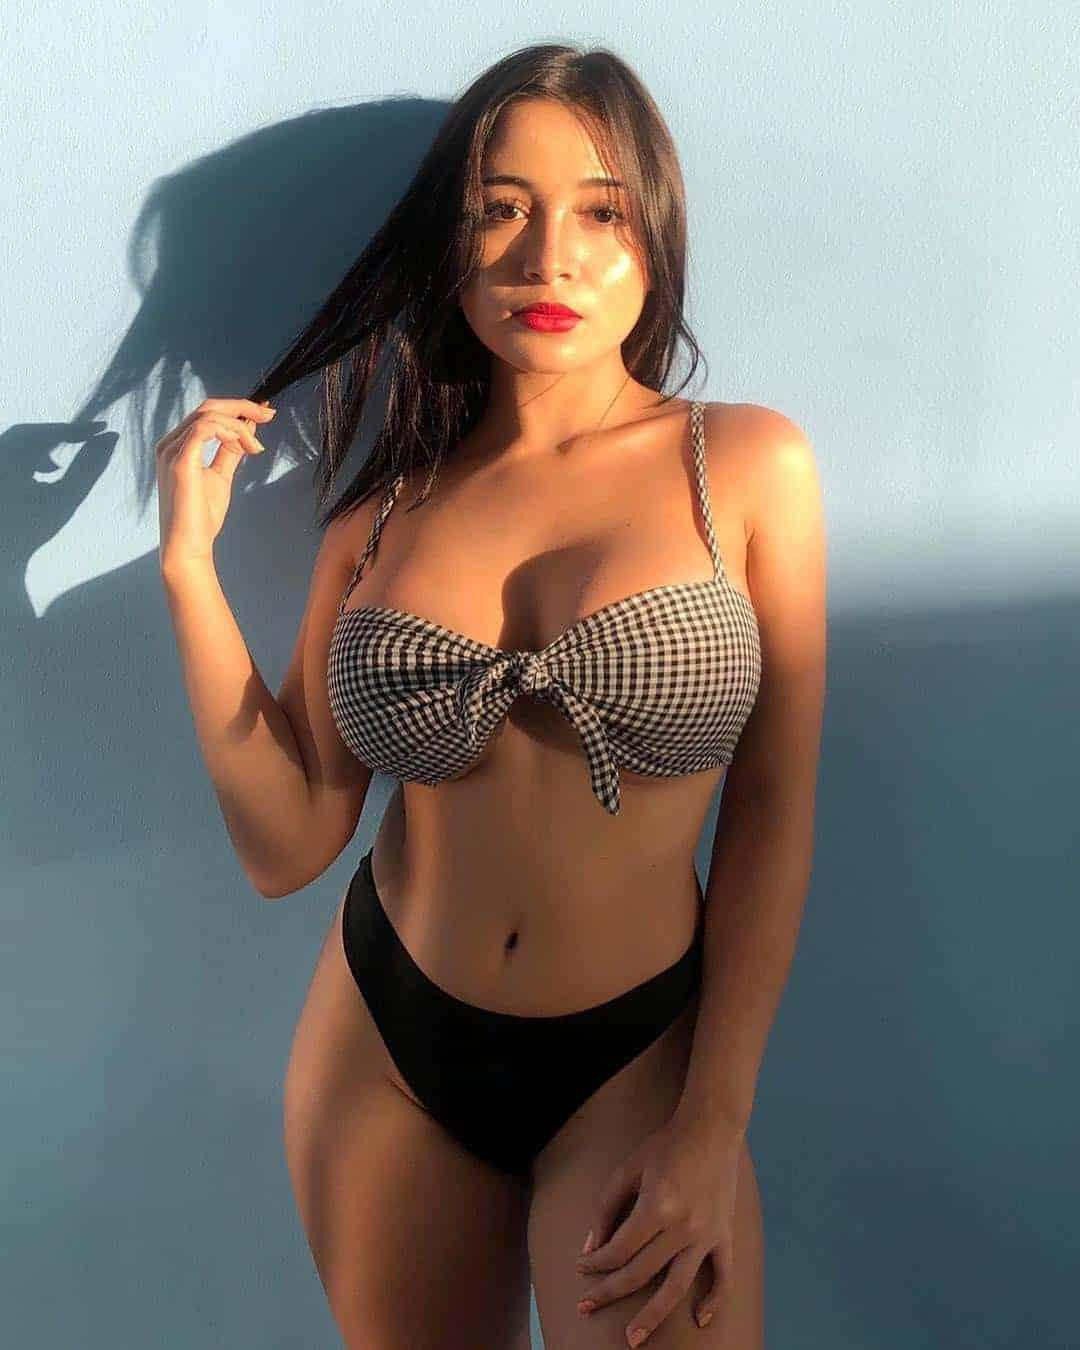 busty_vip_filipina_escorts_call_girls_in-1604528546-586-e